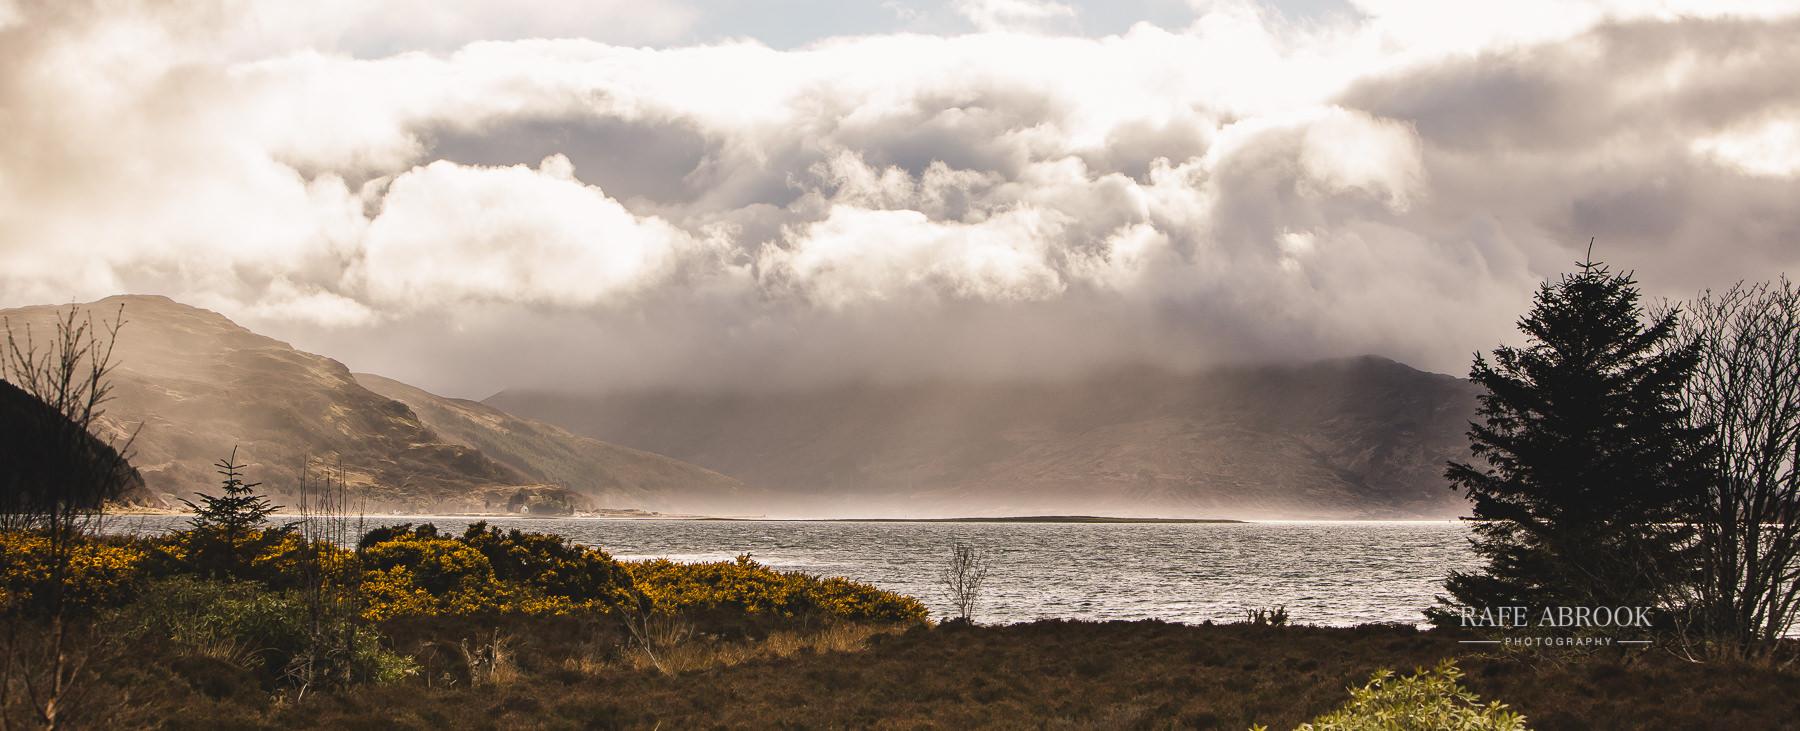 north coast 500 scotland porsche cayman gt4 golf r estate rafe abrook photography-1371.jpg